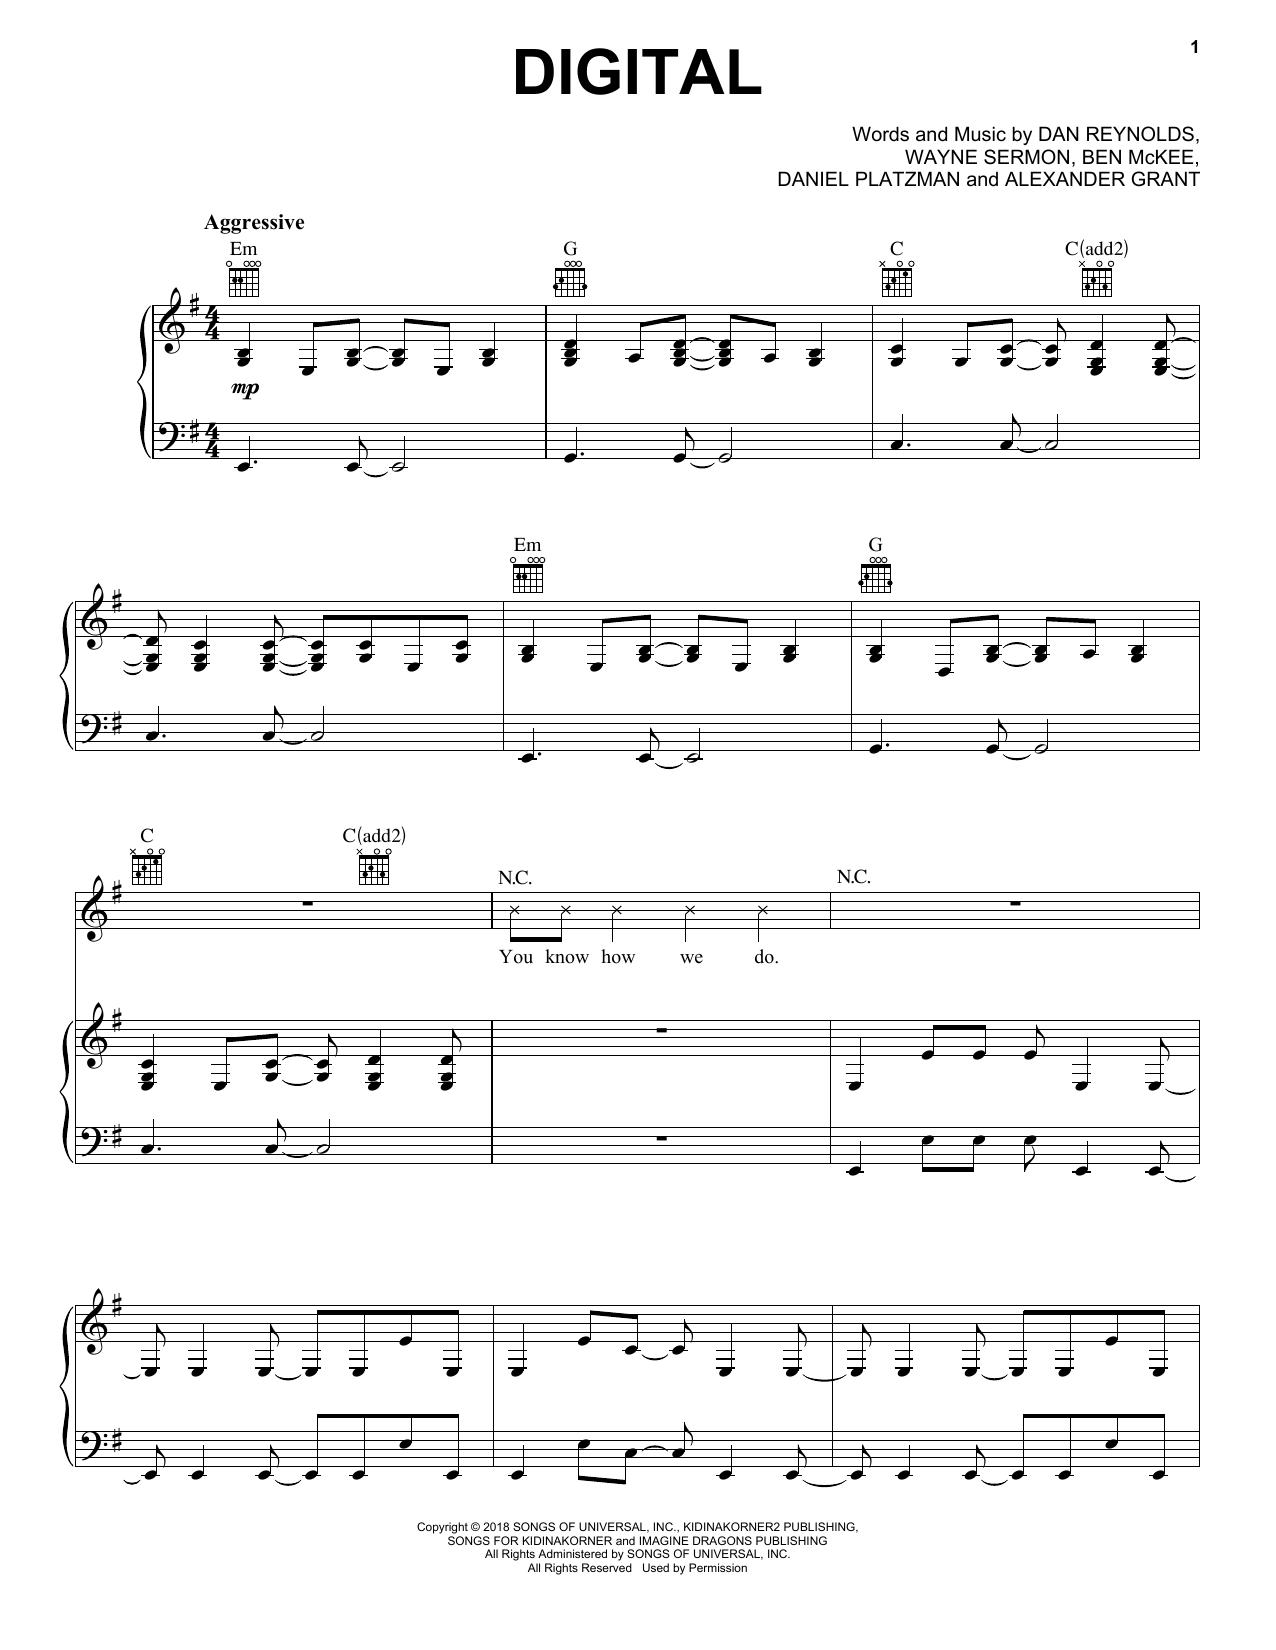 Imagine Dragons Digital sheet music notes and chords. Download Printable PDF.